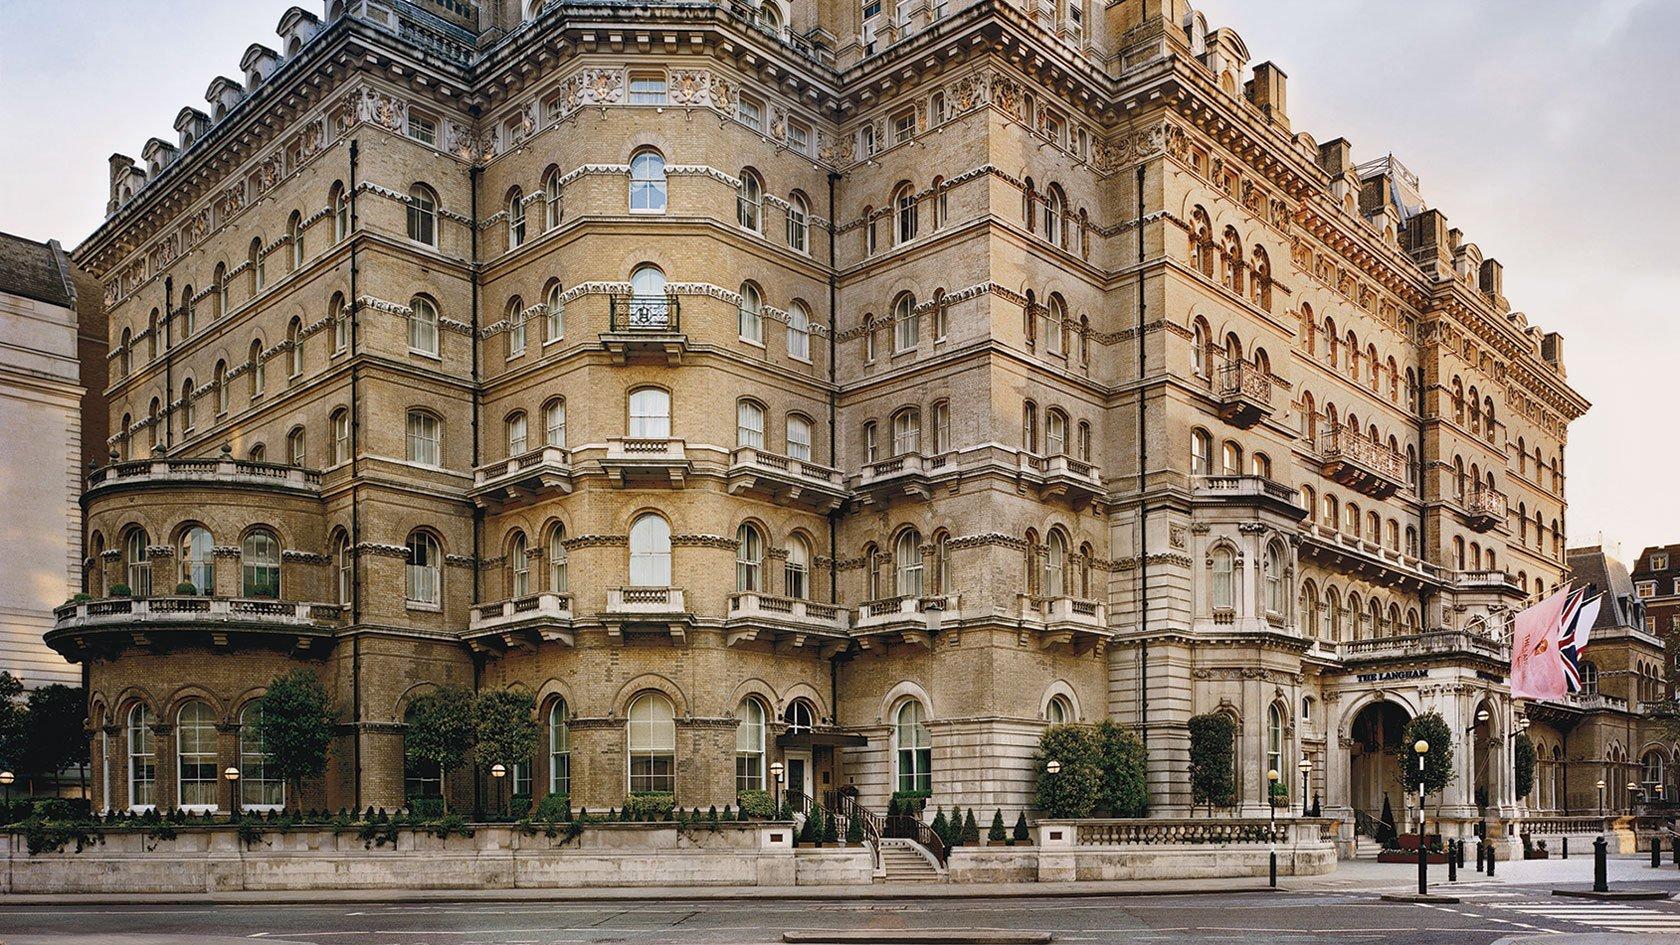 The Langham Hotel in London